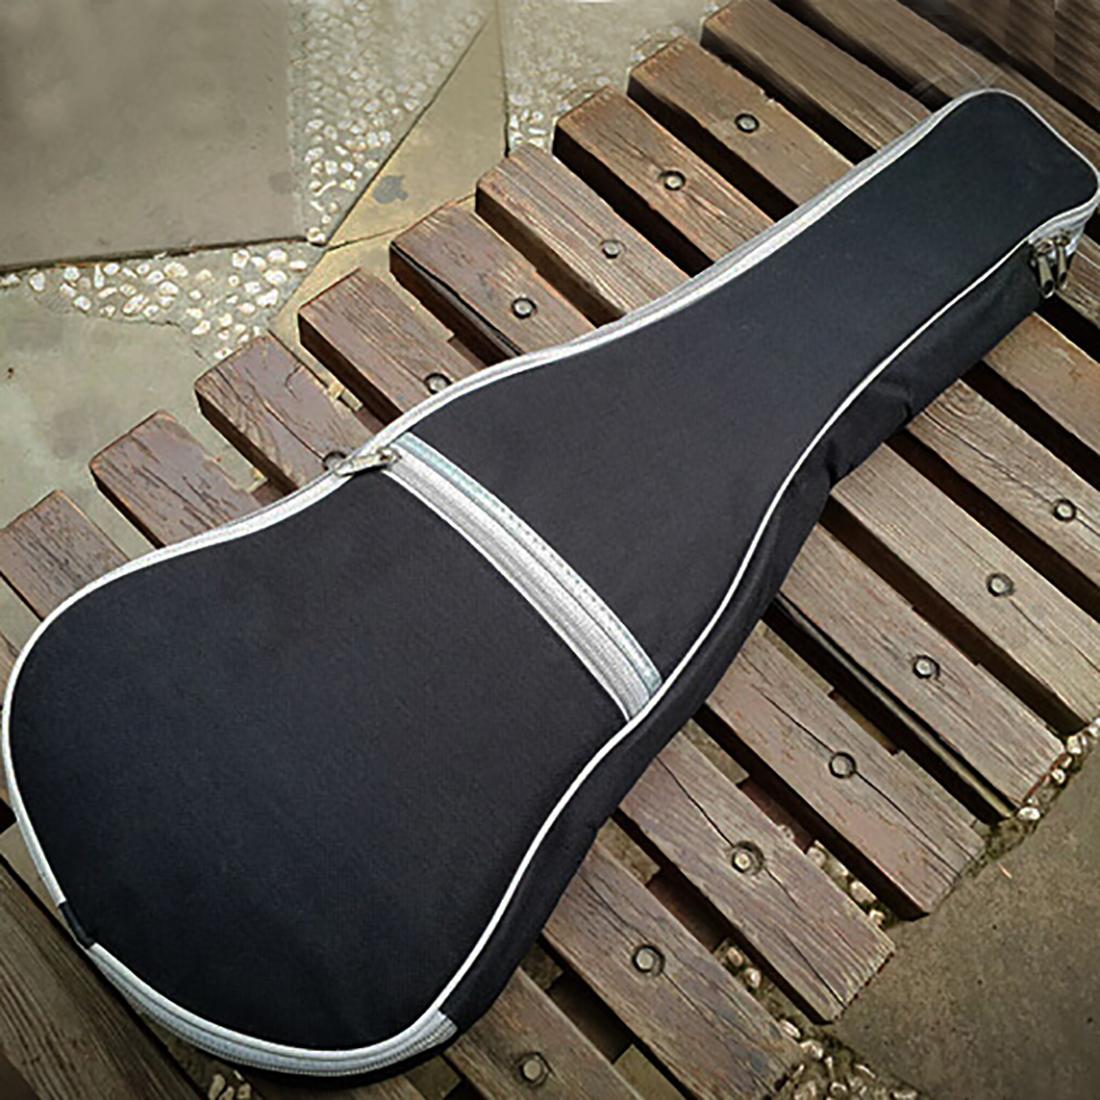 online buy wholesale ukulele parts from china ukulele parts wholesalers. Black Bedroom Furniture Sets. Home Design Ideas